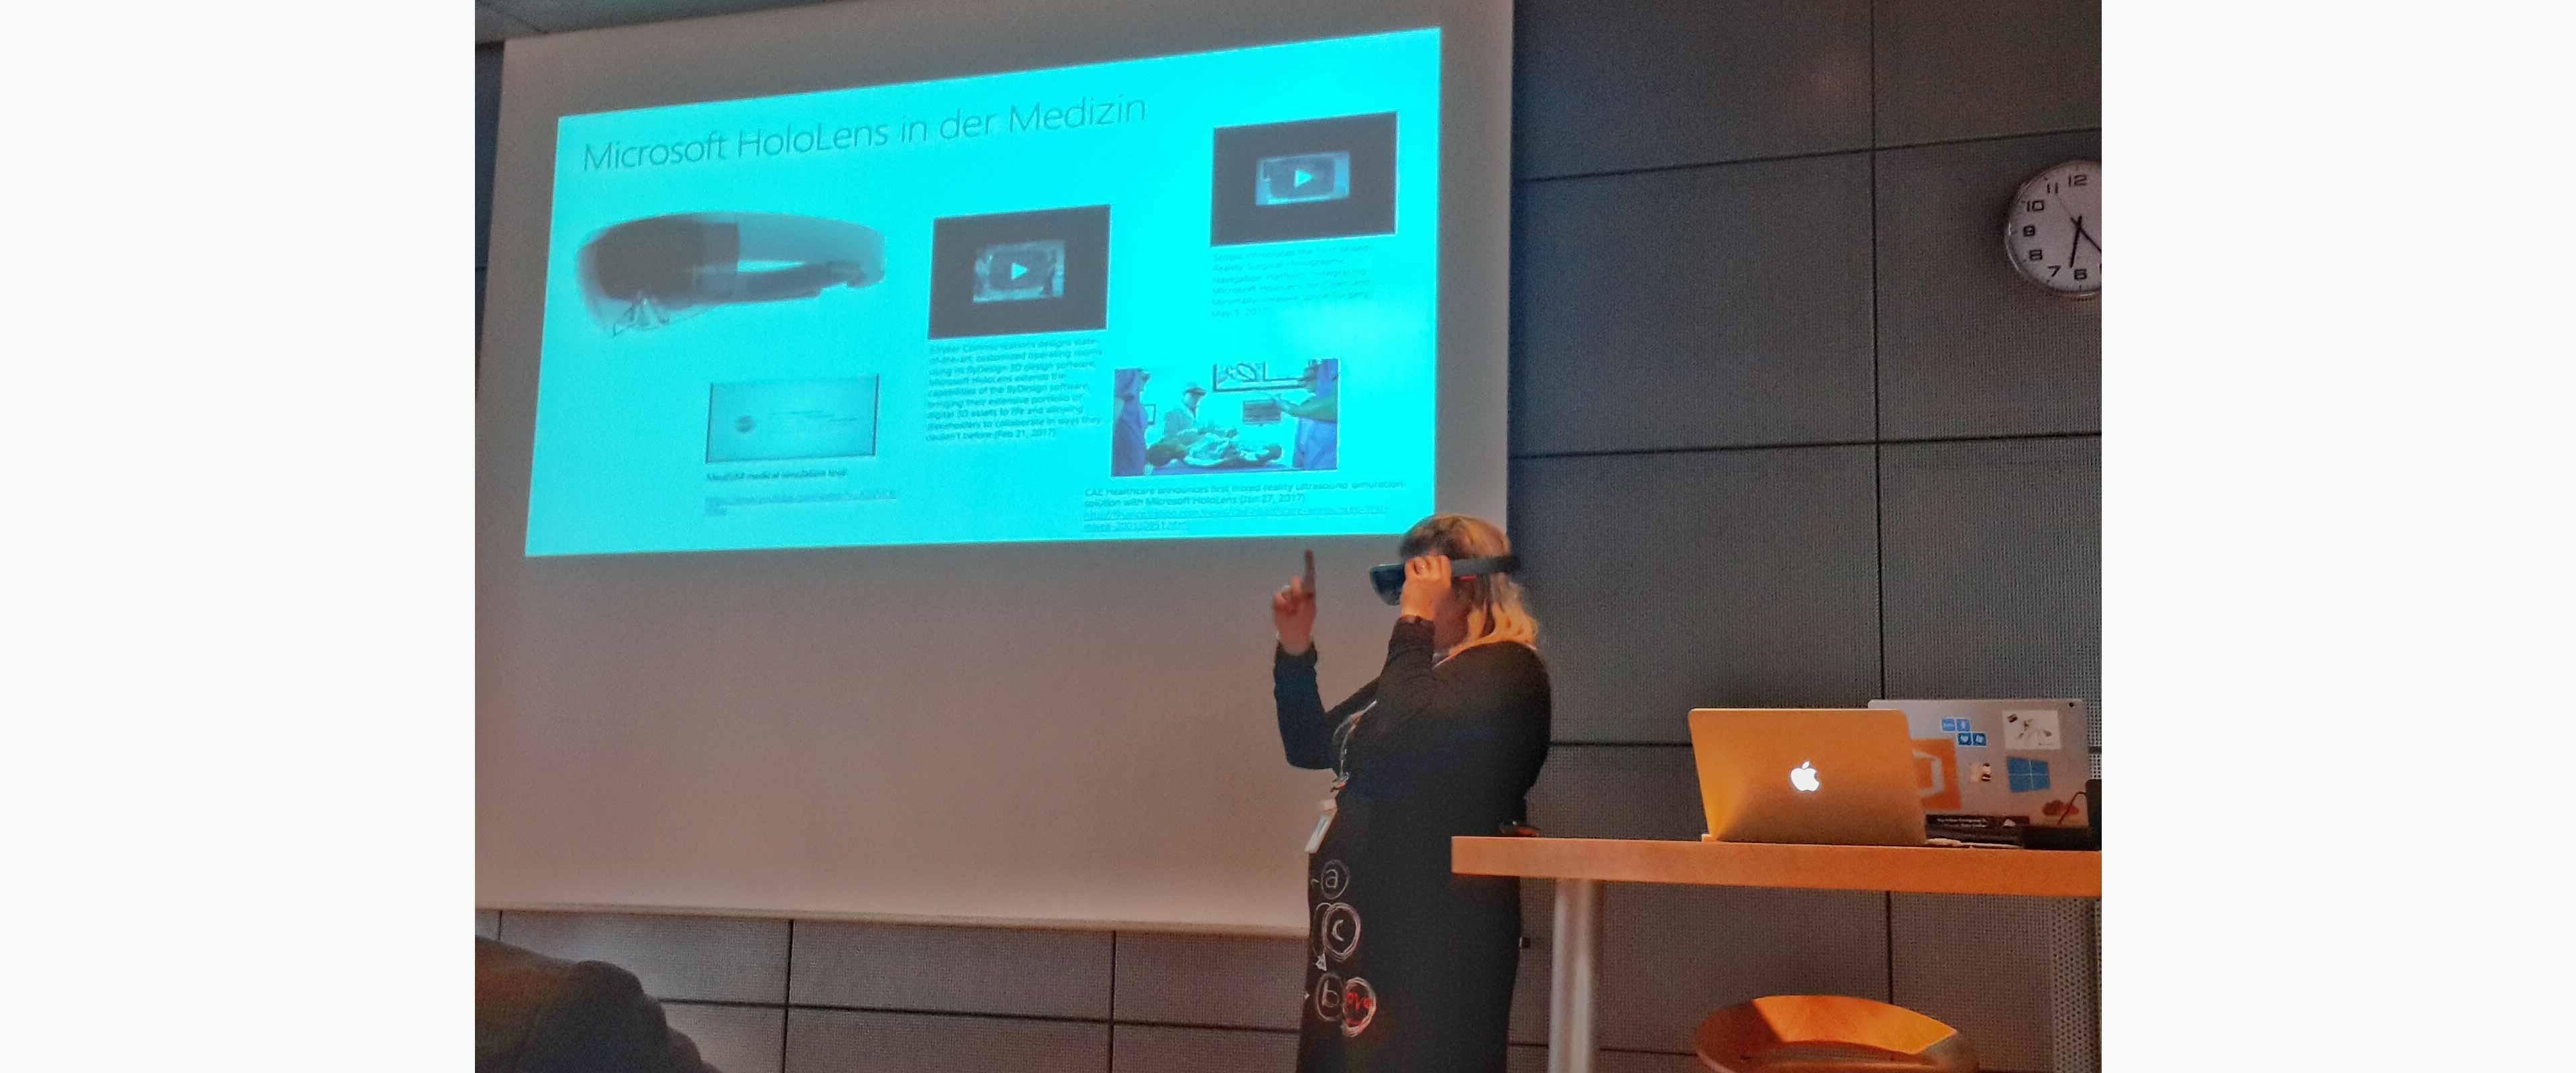 microsoft-holo-lense-medien-whats-health